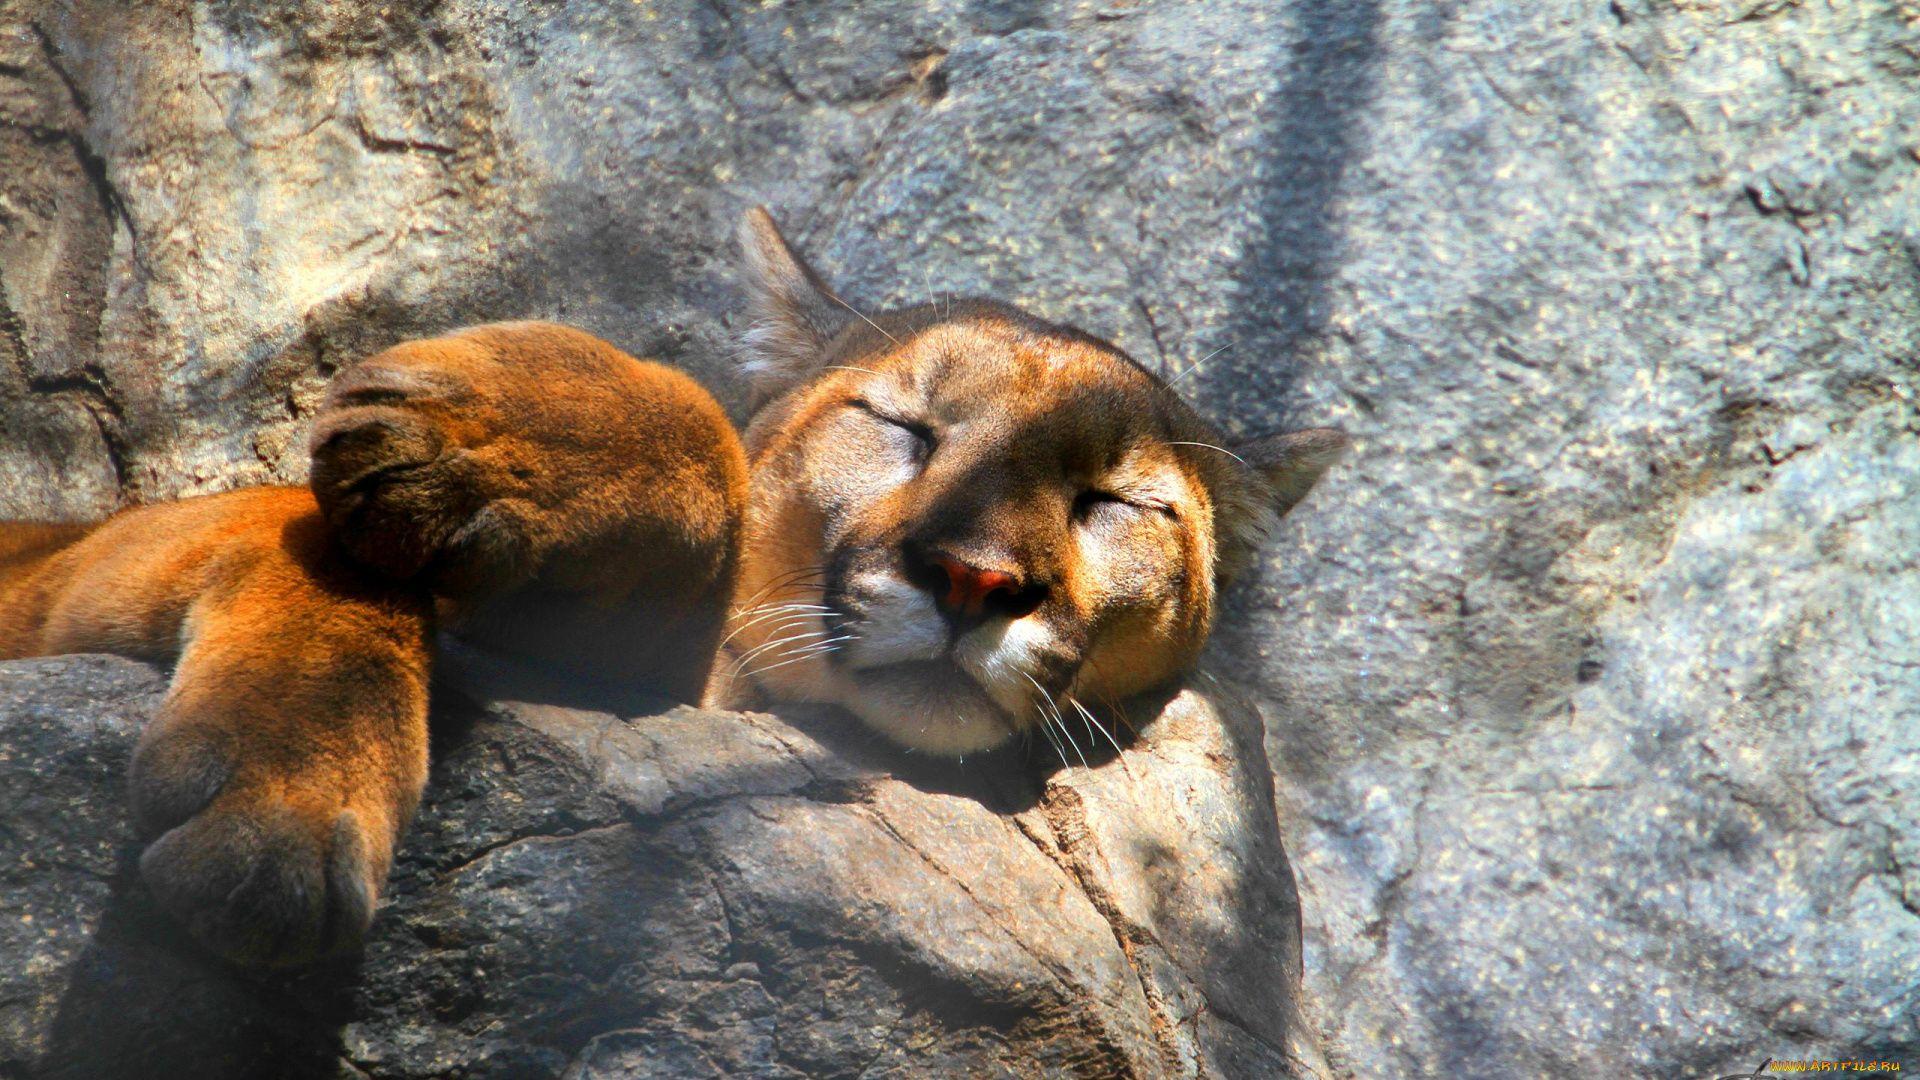 Cougar Hd full hd wallpaper download